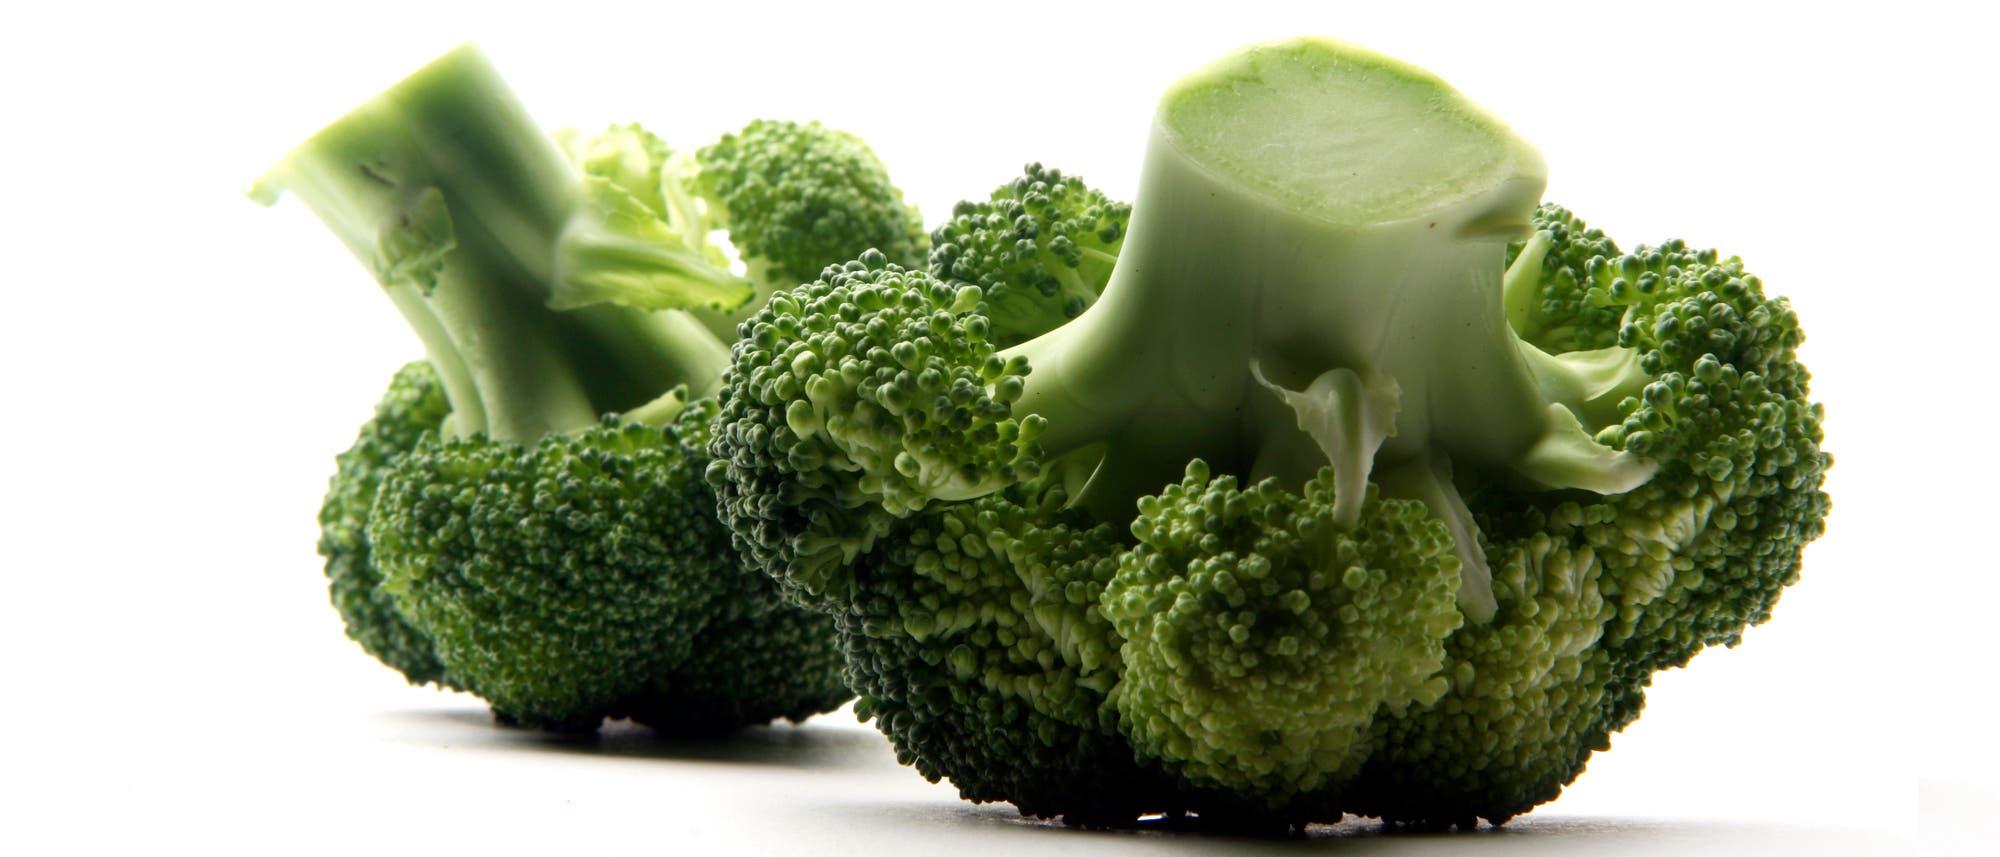 Zwei kleine Brokkoli